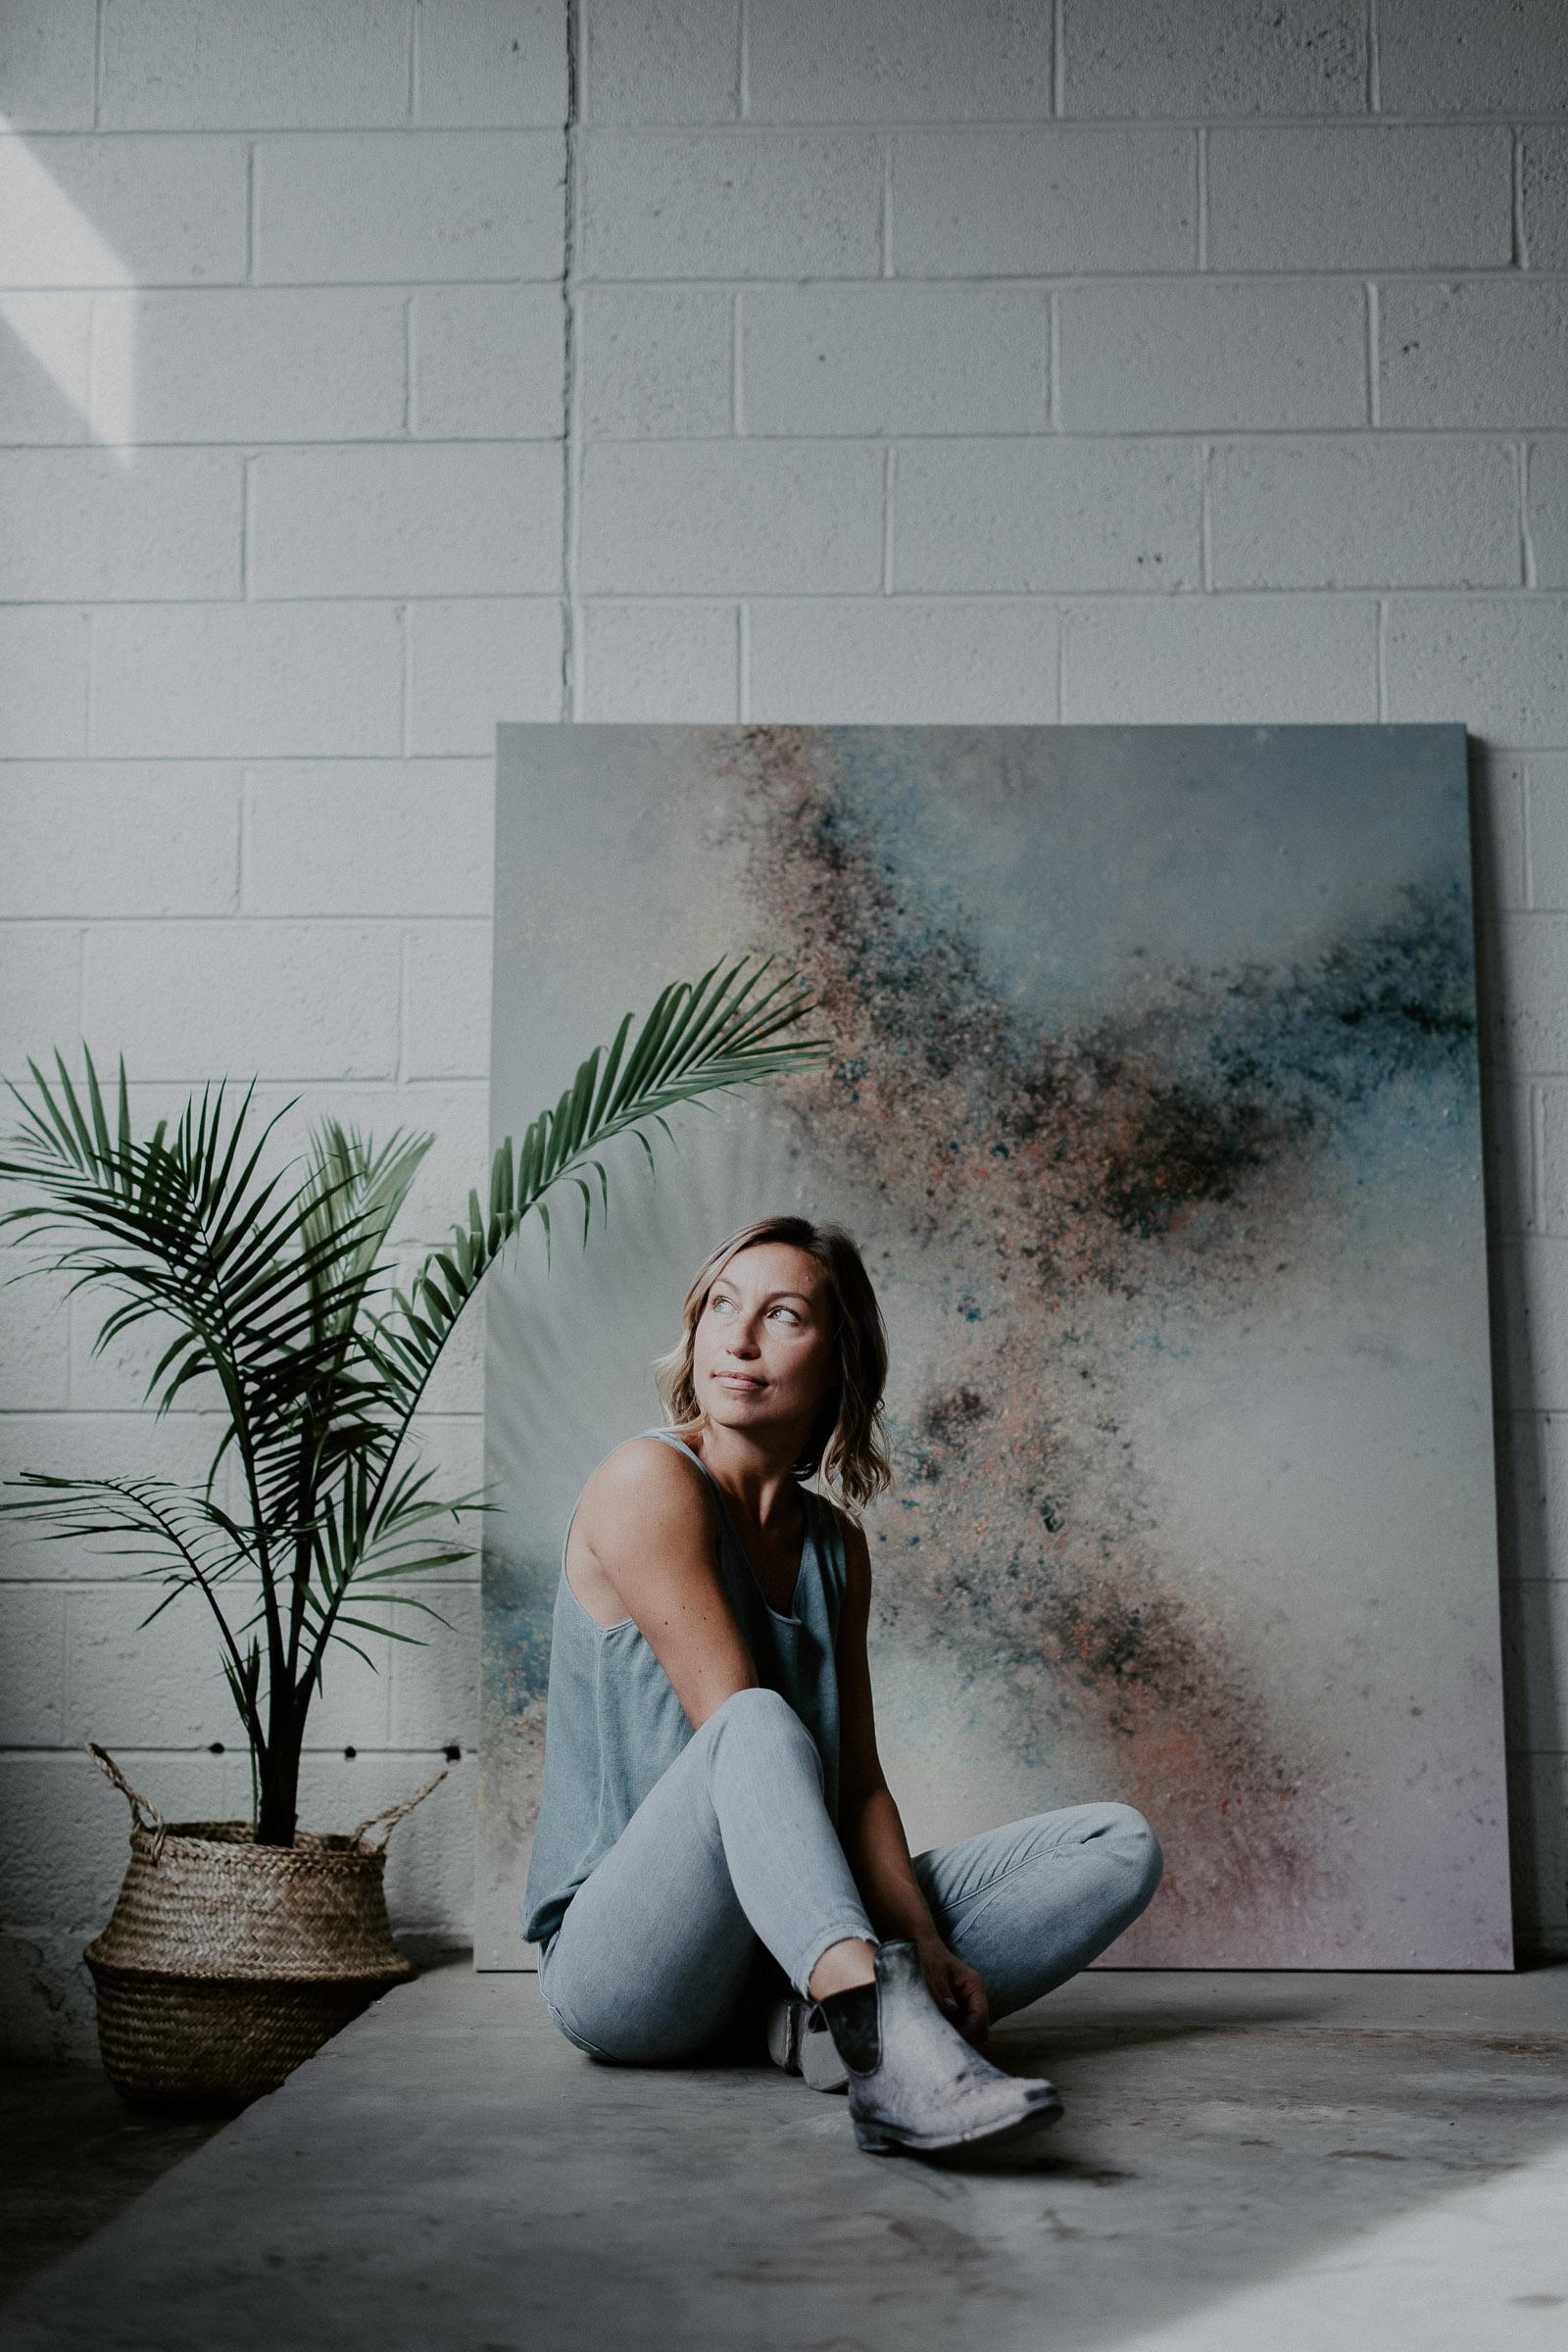 portrait session of an artist